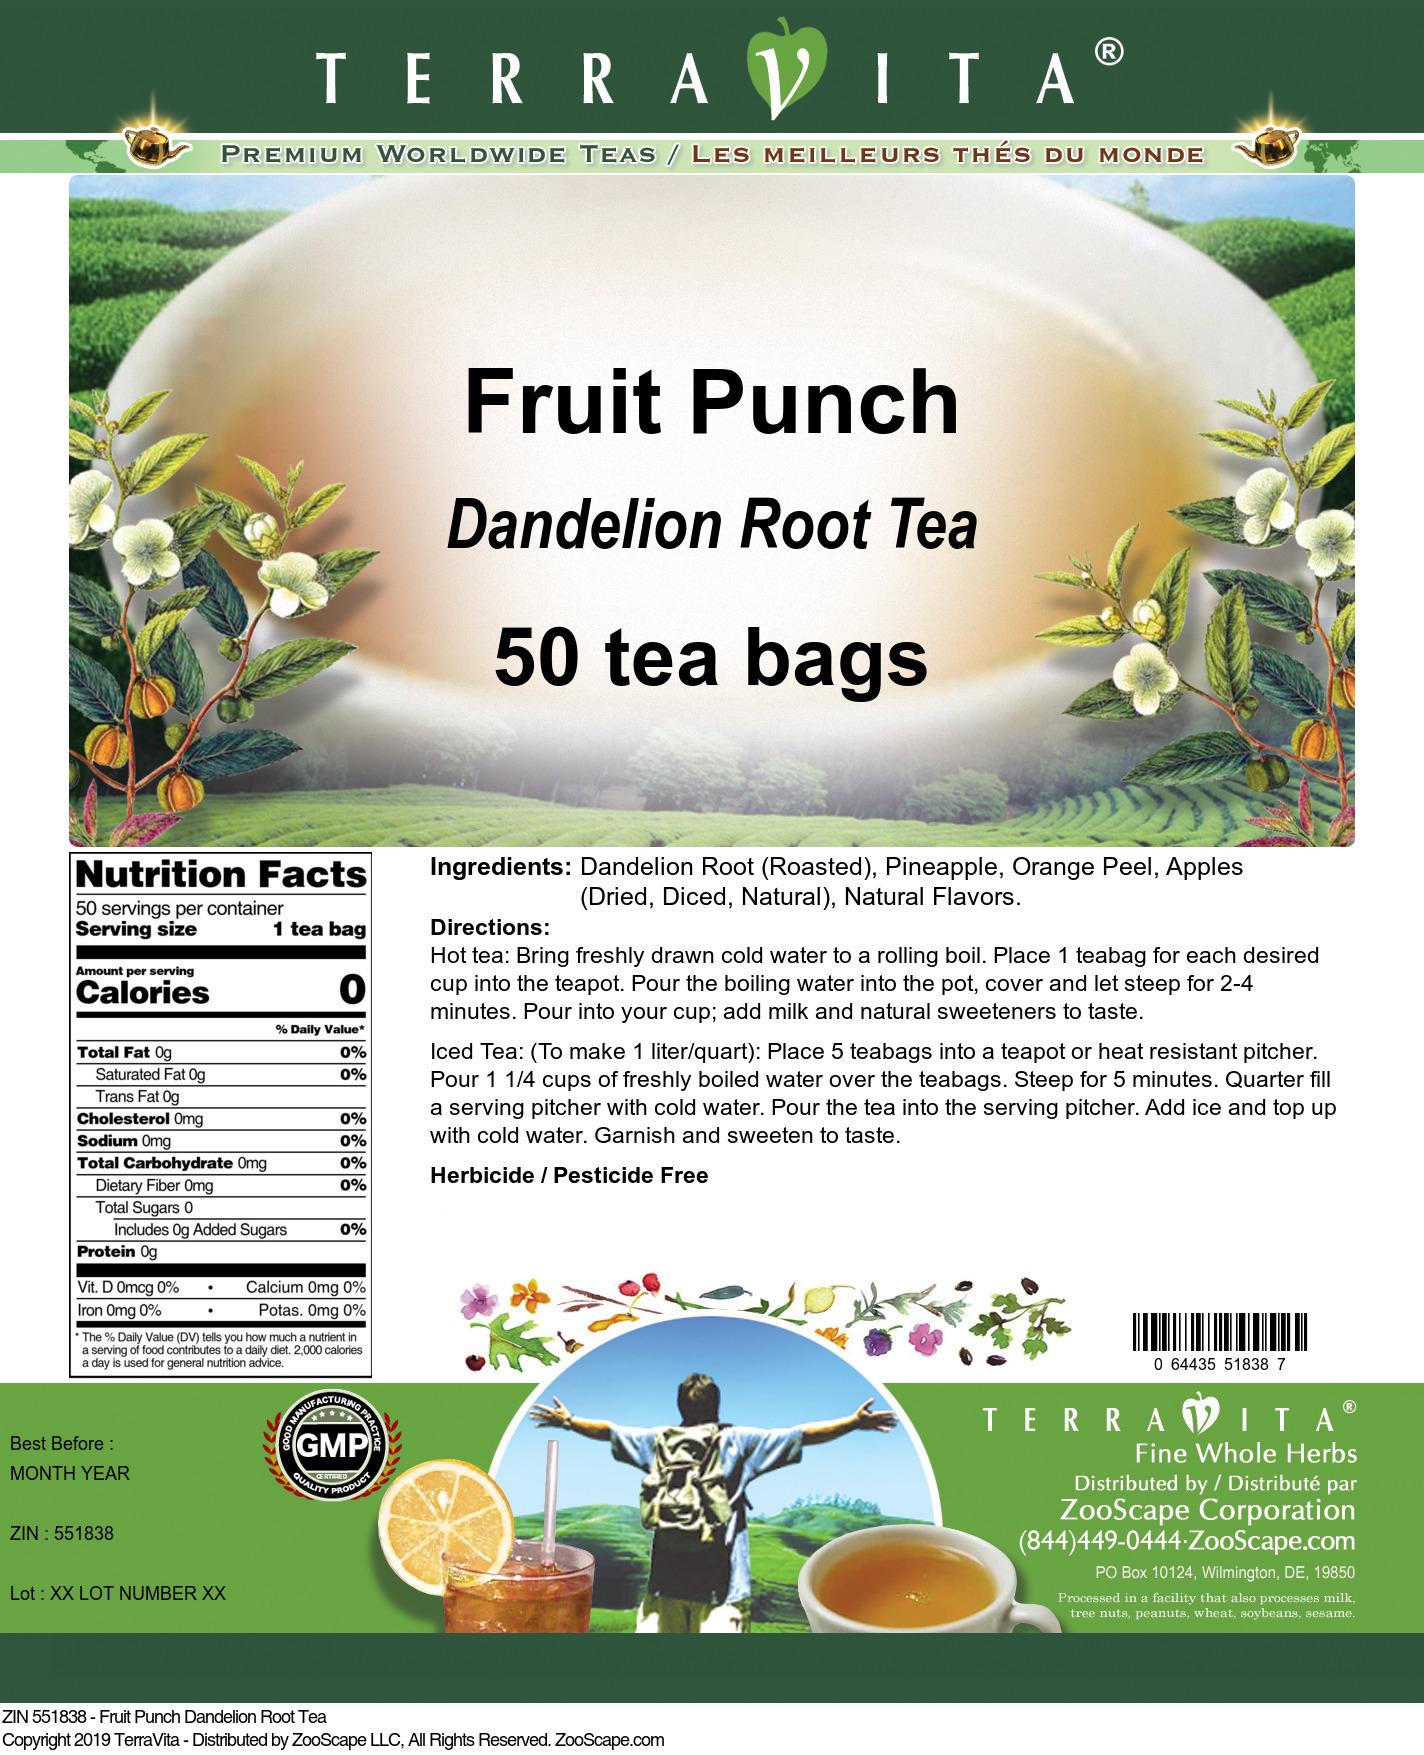 Fruit Punch Dandelion Root